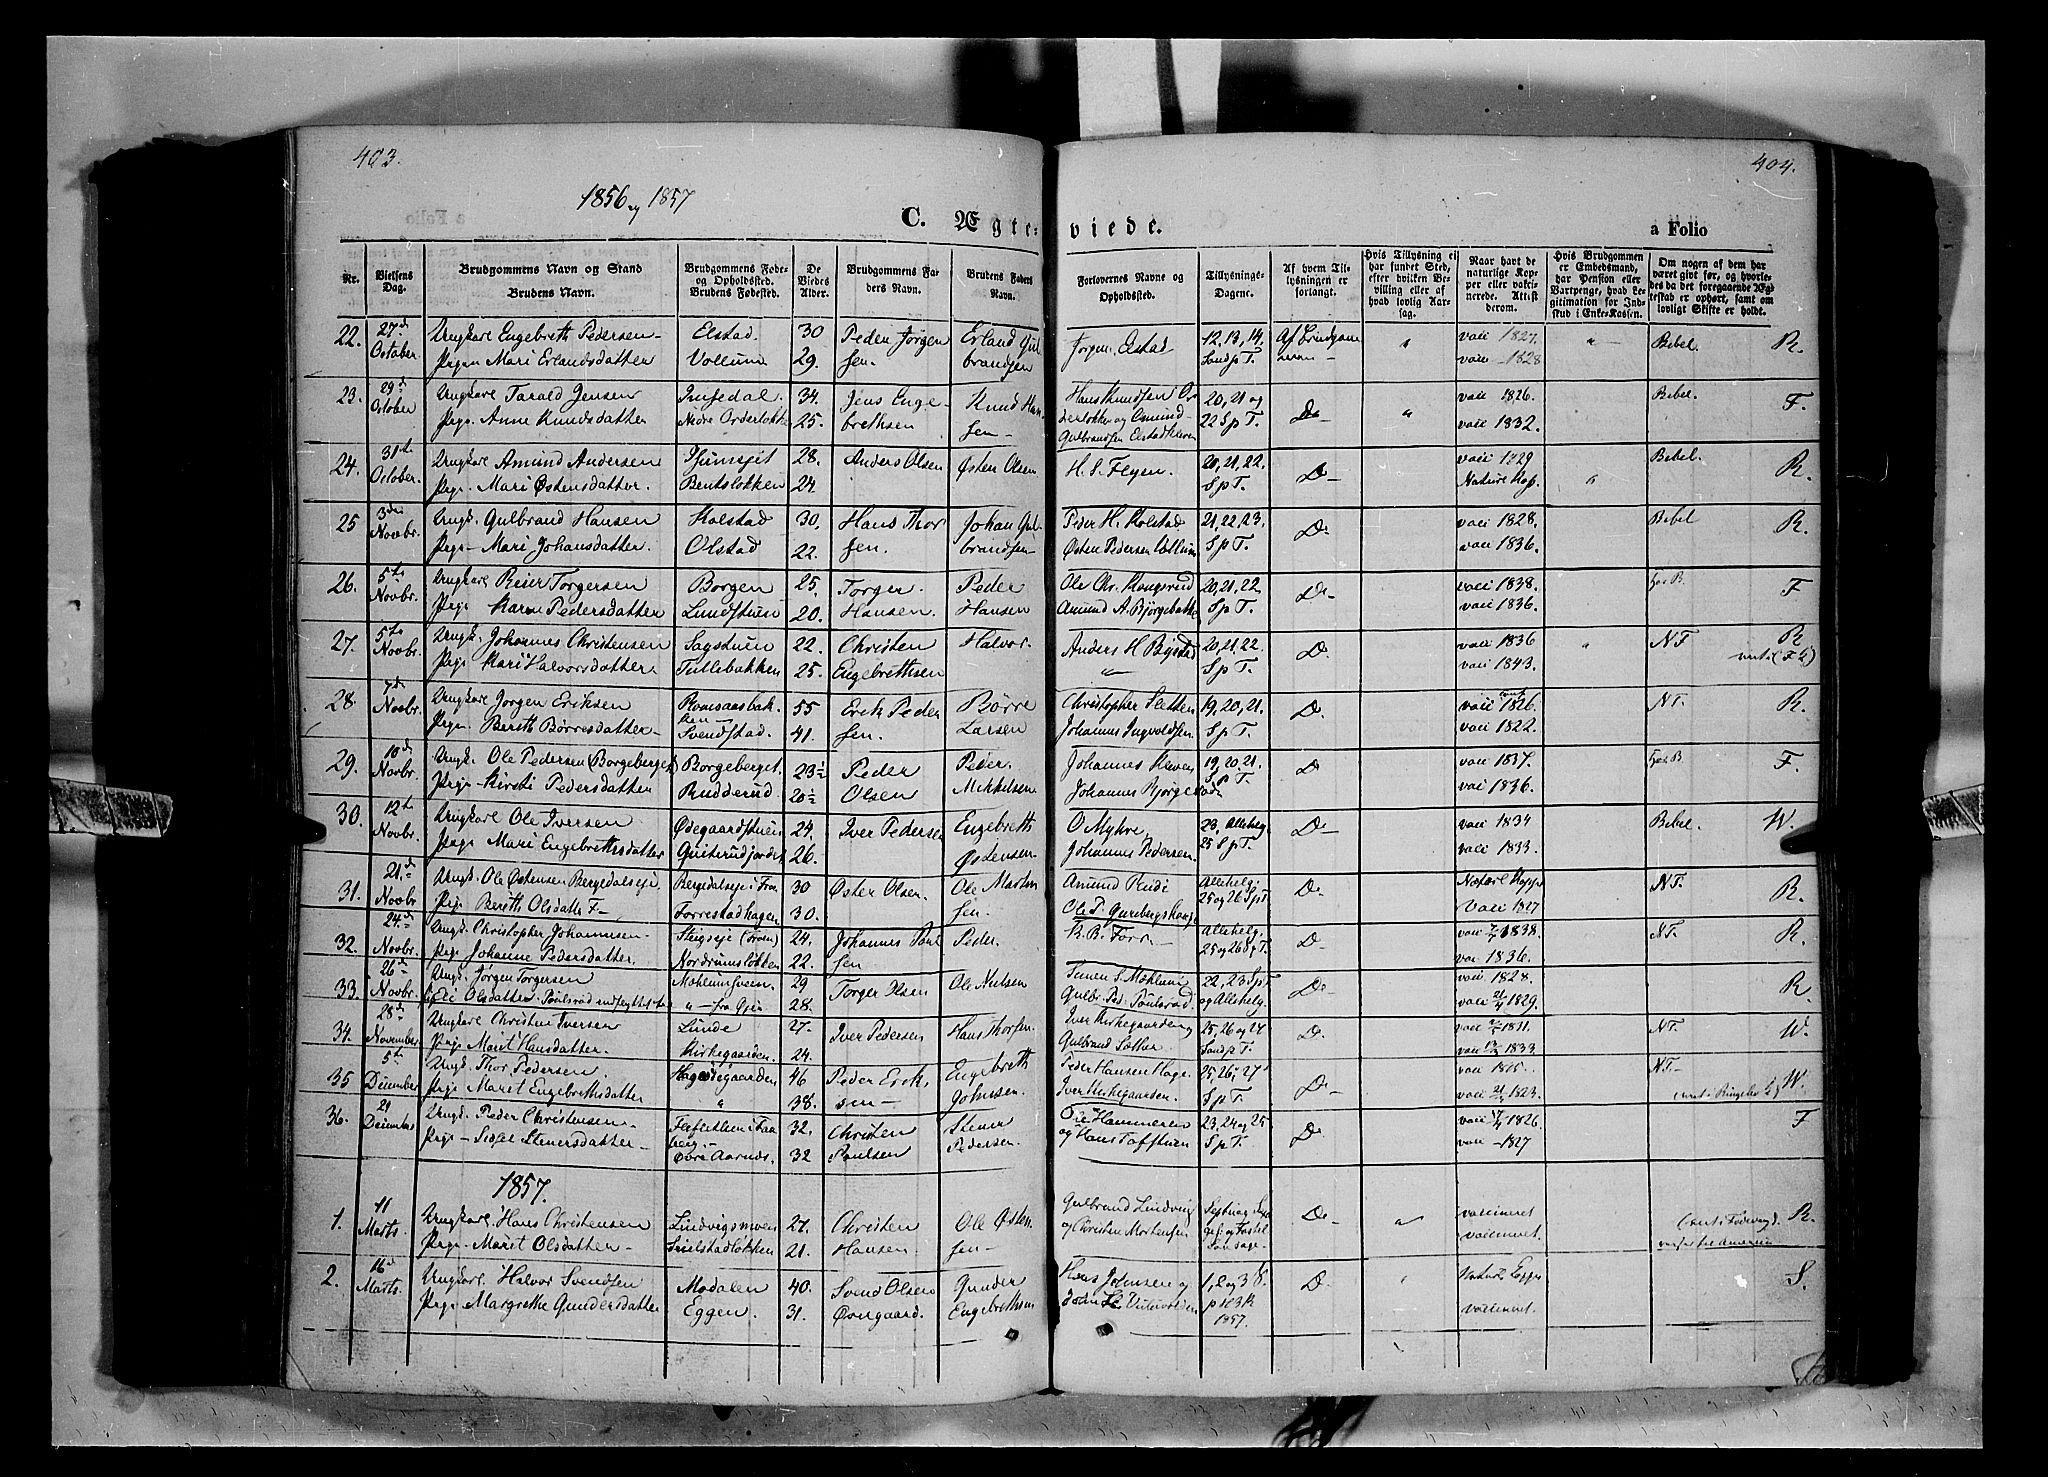 SAH, Ringebu prestekontor, Ministerialbok nr. 6, 1848-1859, s. 403-404